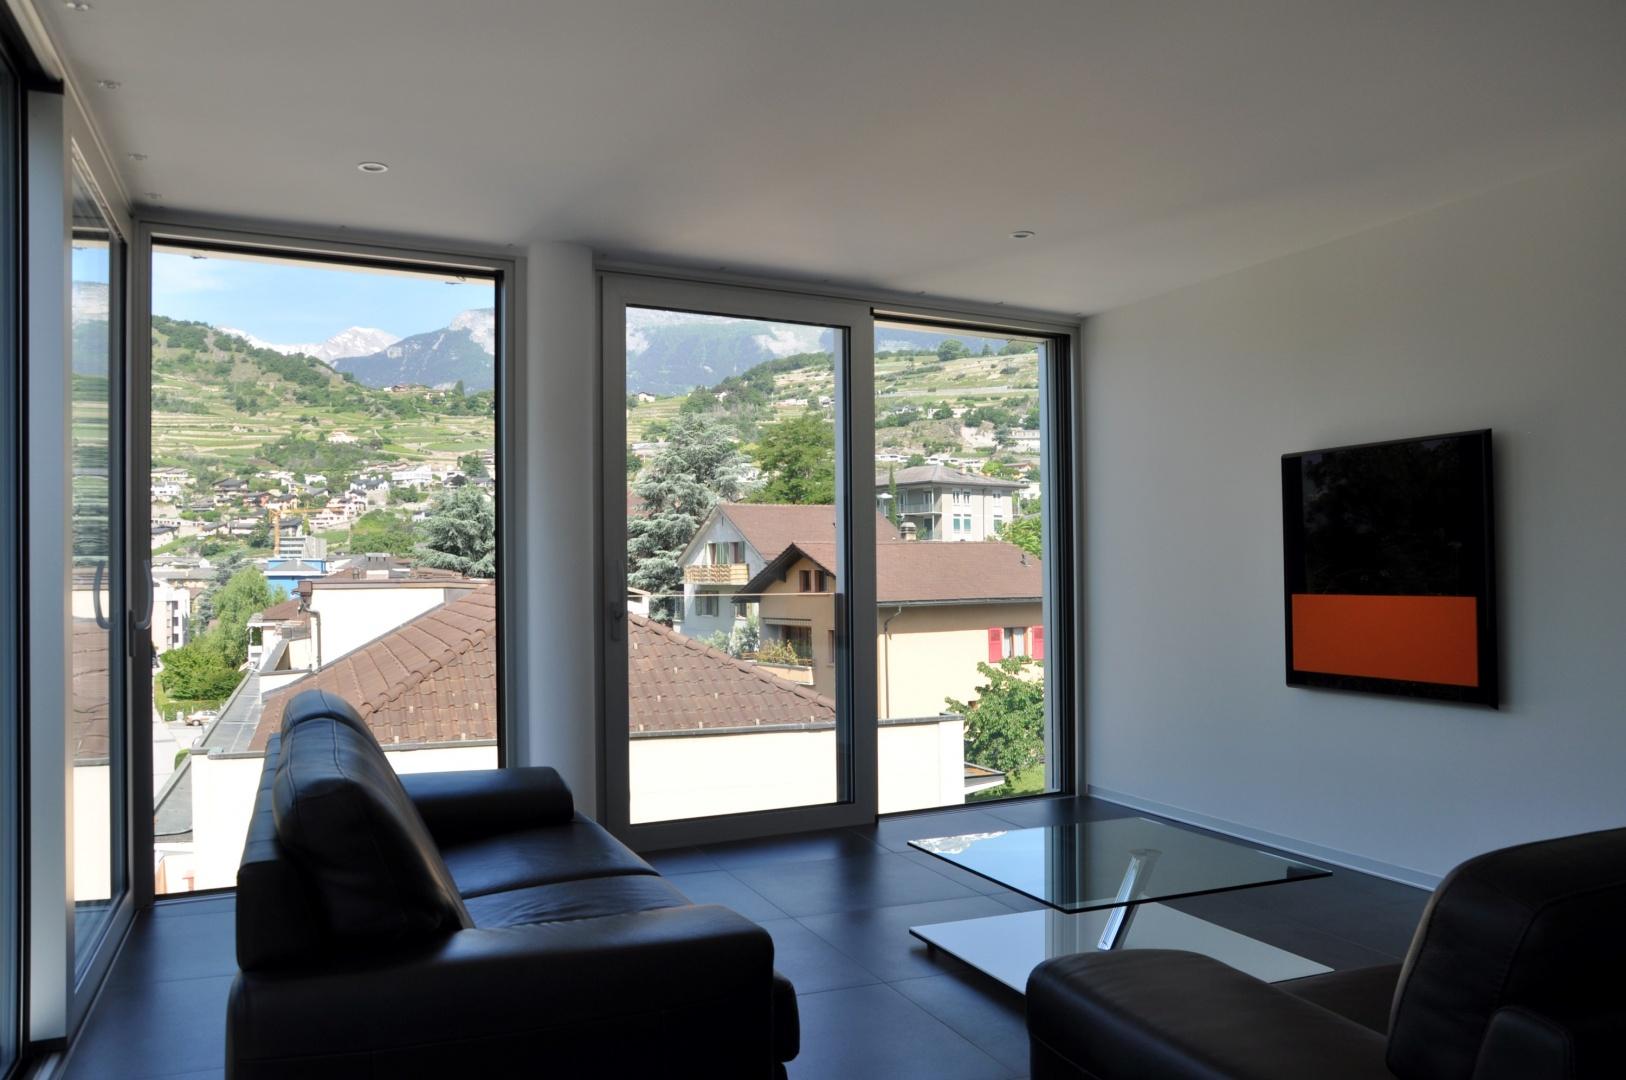 Vue intérieure 2 appartement © Savioz & Di Berardino architectes